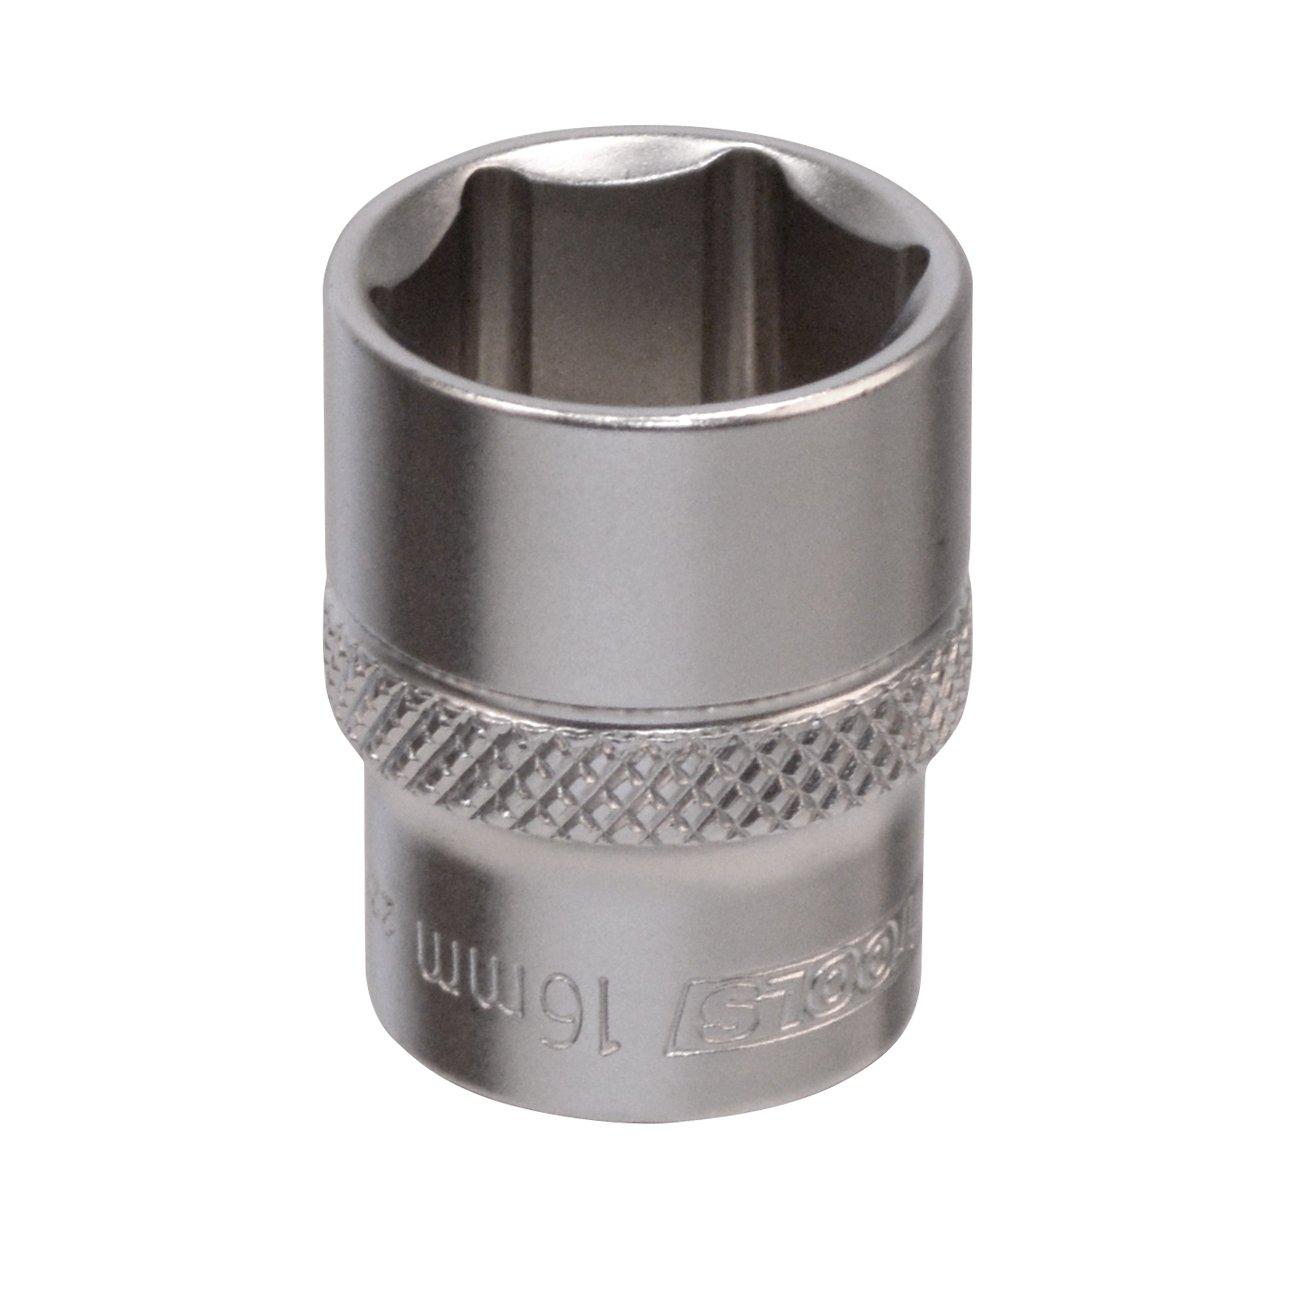 OEMTOOLS  22290 16 mm Metric Socket